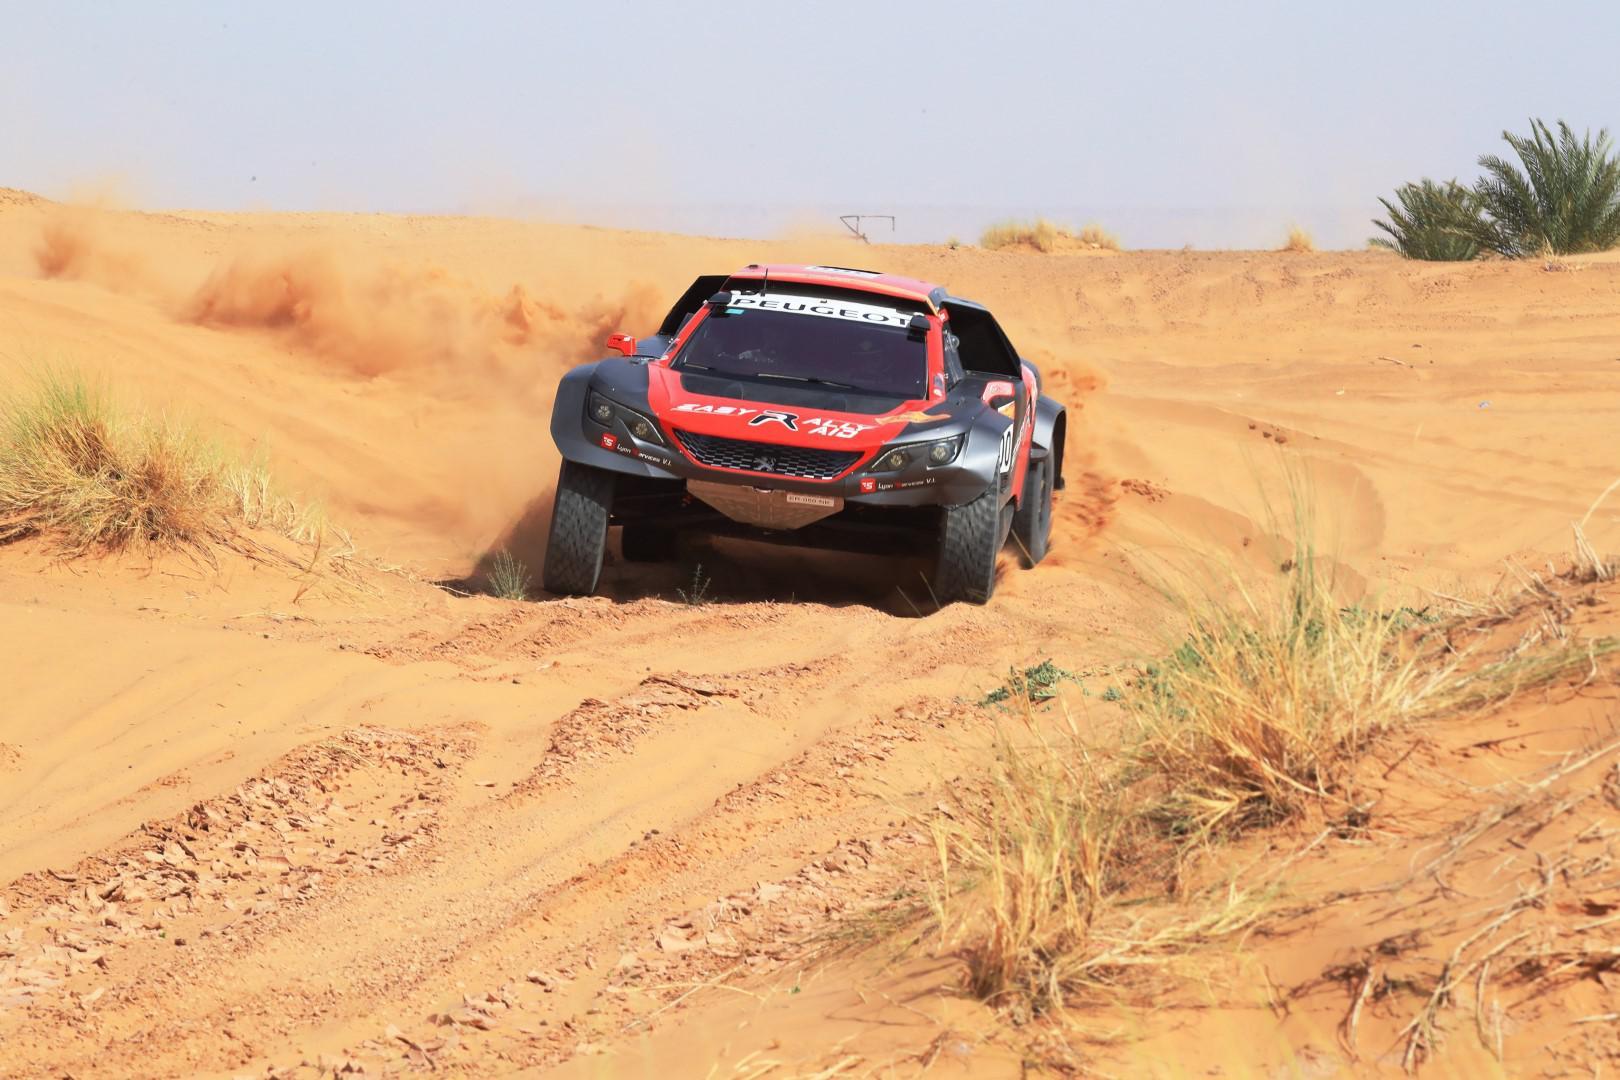 dakar-2019-jean-pascal-besson-affronte-le-desert-du-perou-922-2.jpg